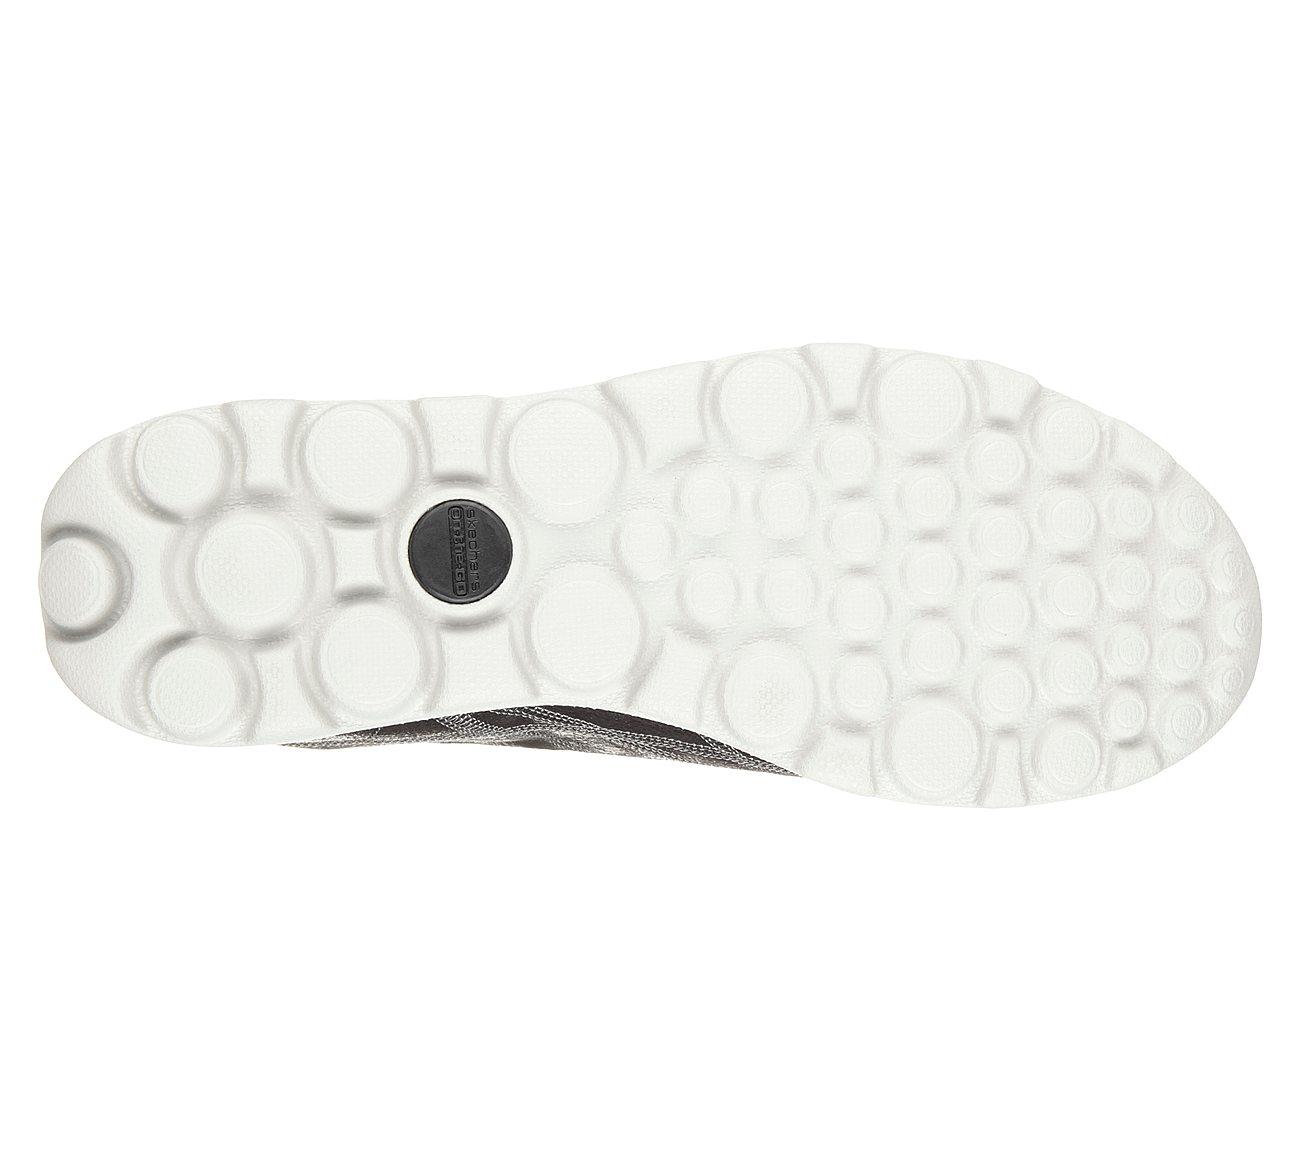 skechers on the go men's shoes